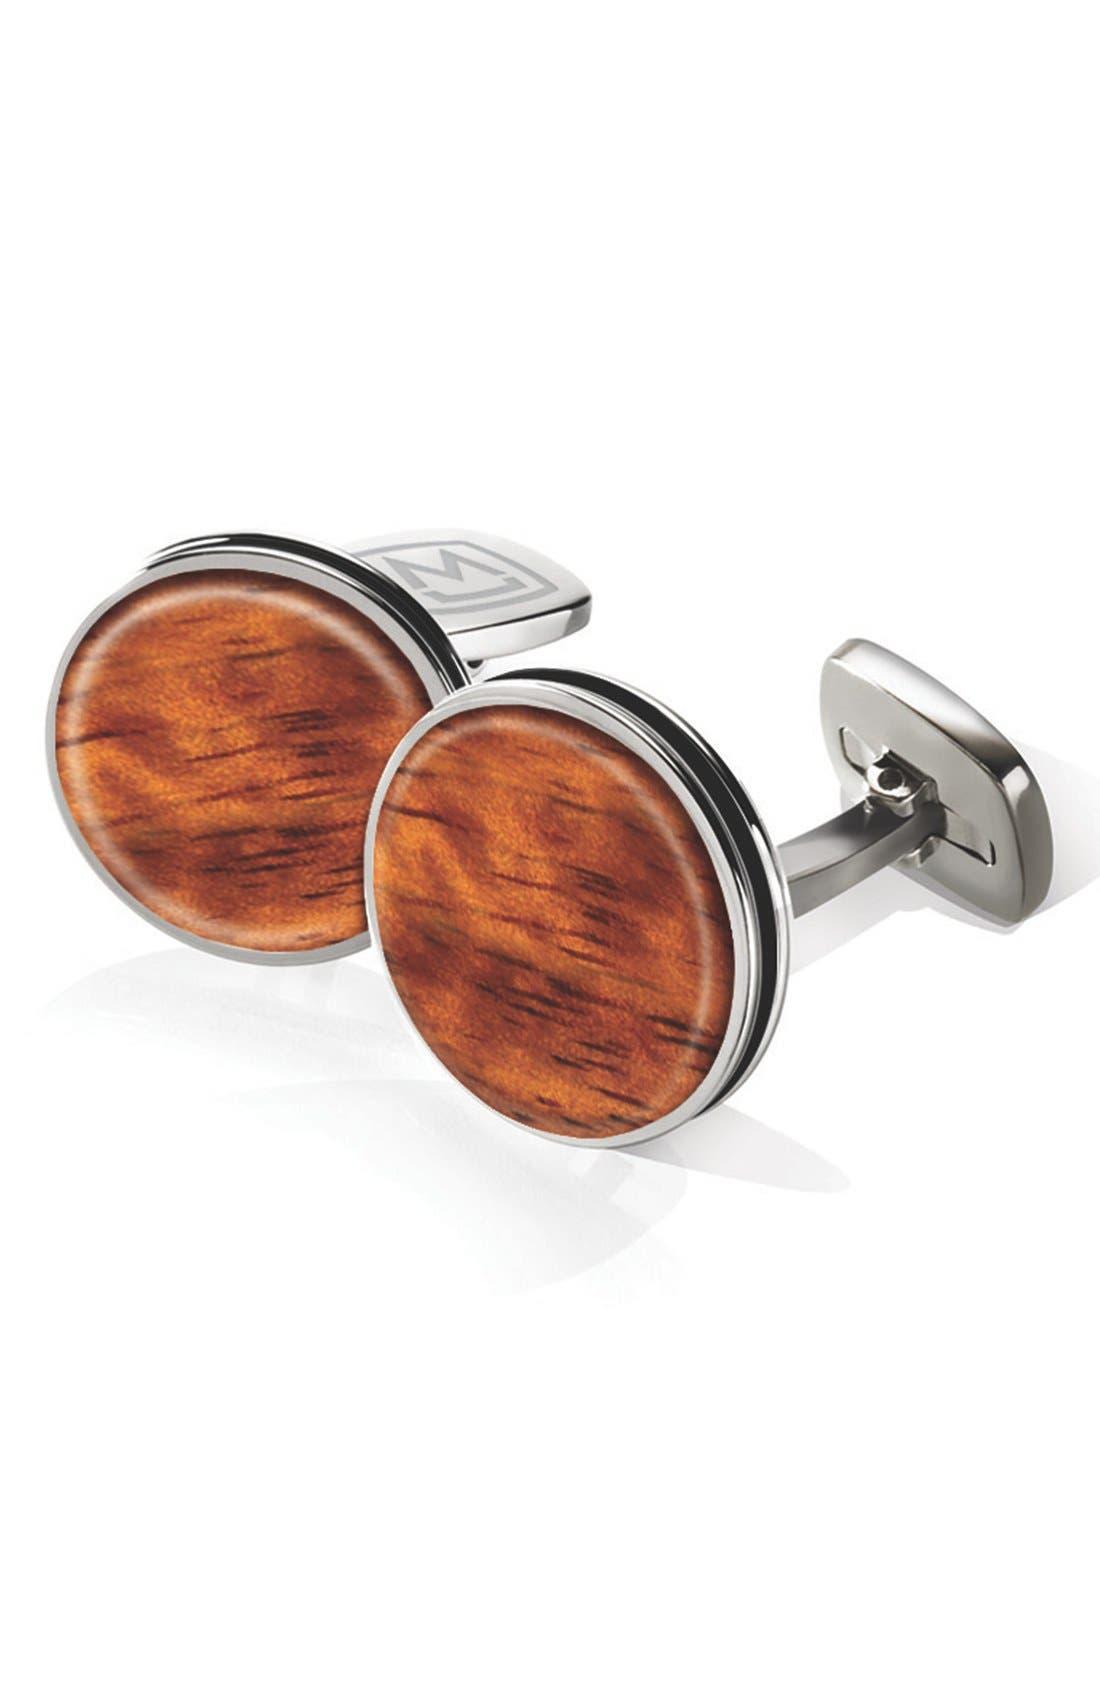 Bubinga Cuff Links,                         Main,                         color, Stainless Steel/ Bubinga Brown